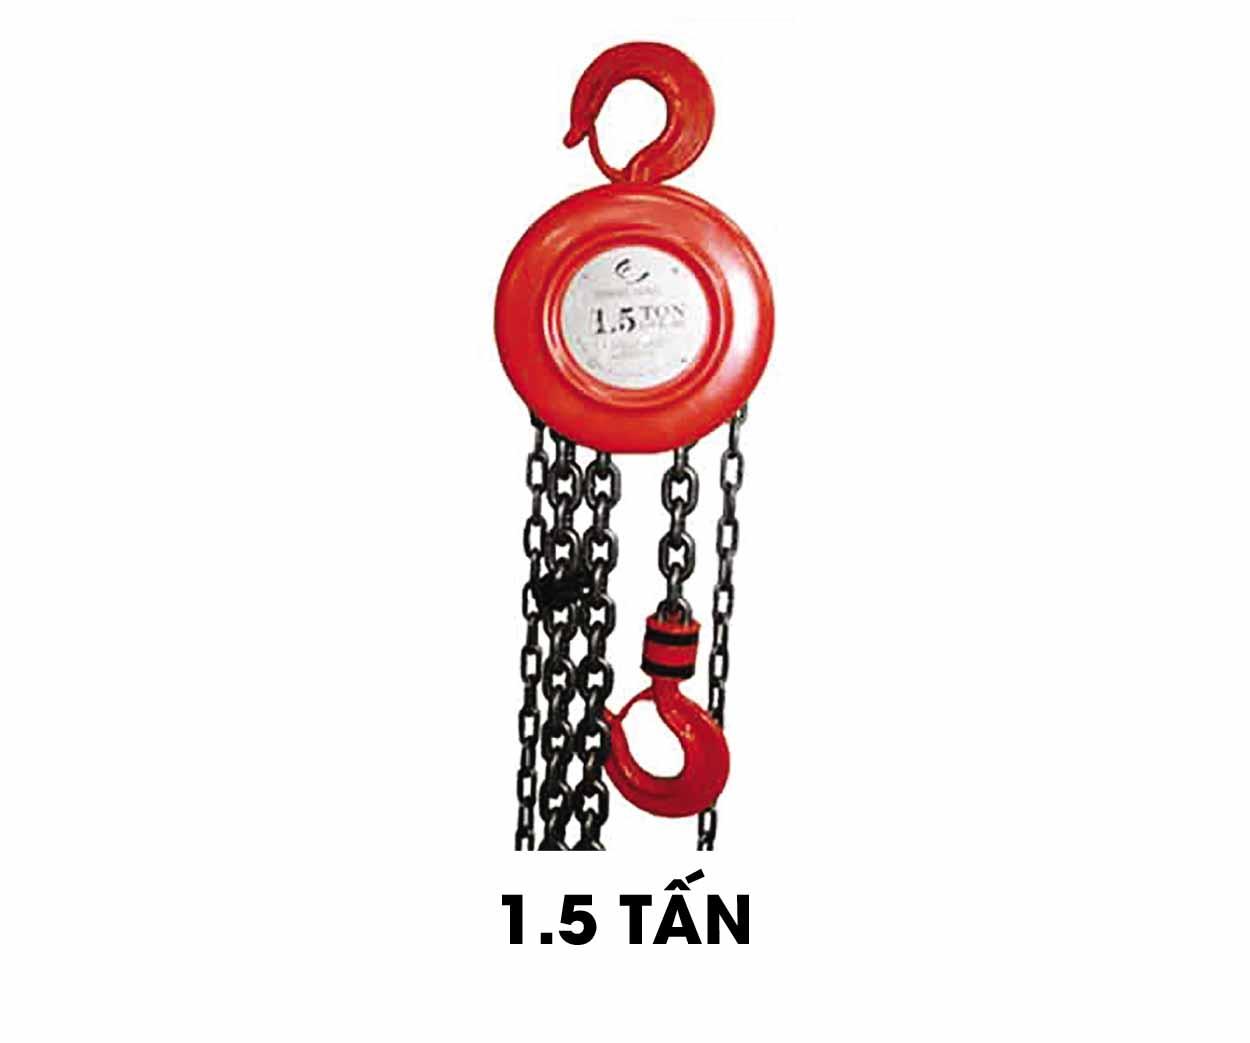 Palang xích tay 1.5 tấn Ssangyong (SY-1.5)